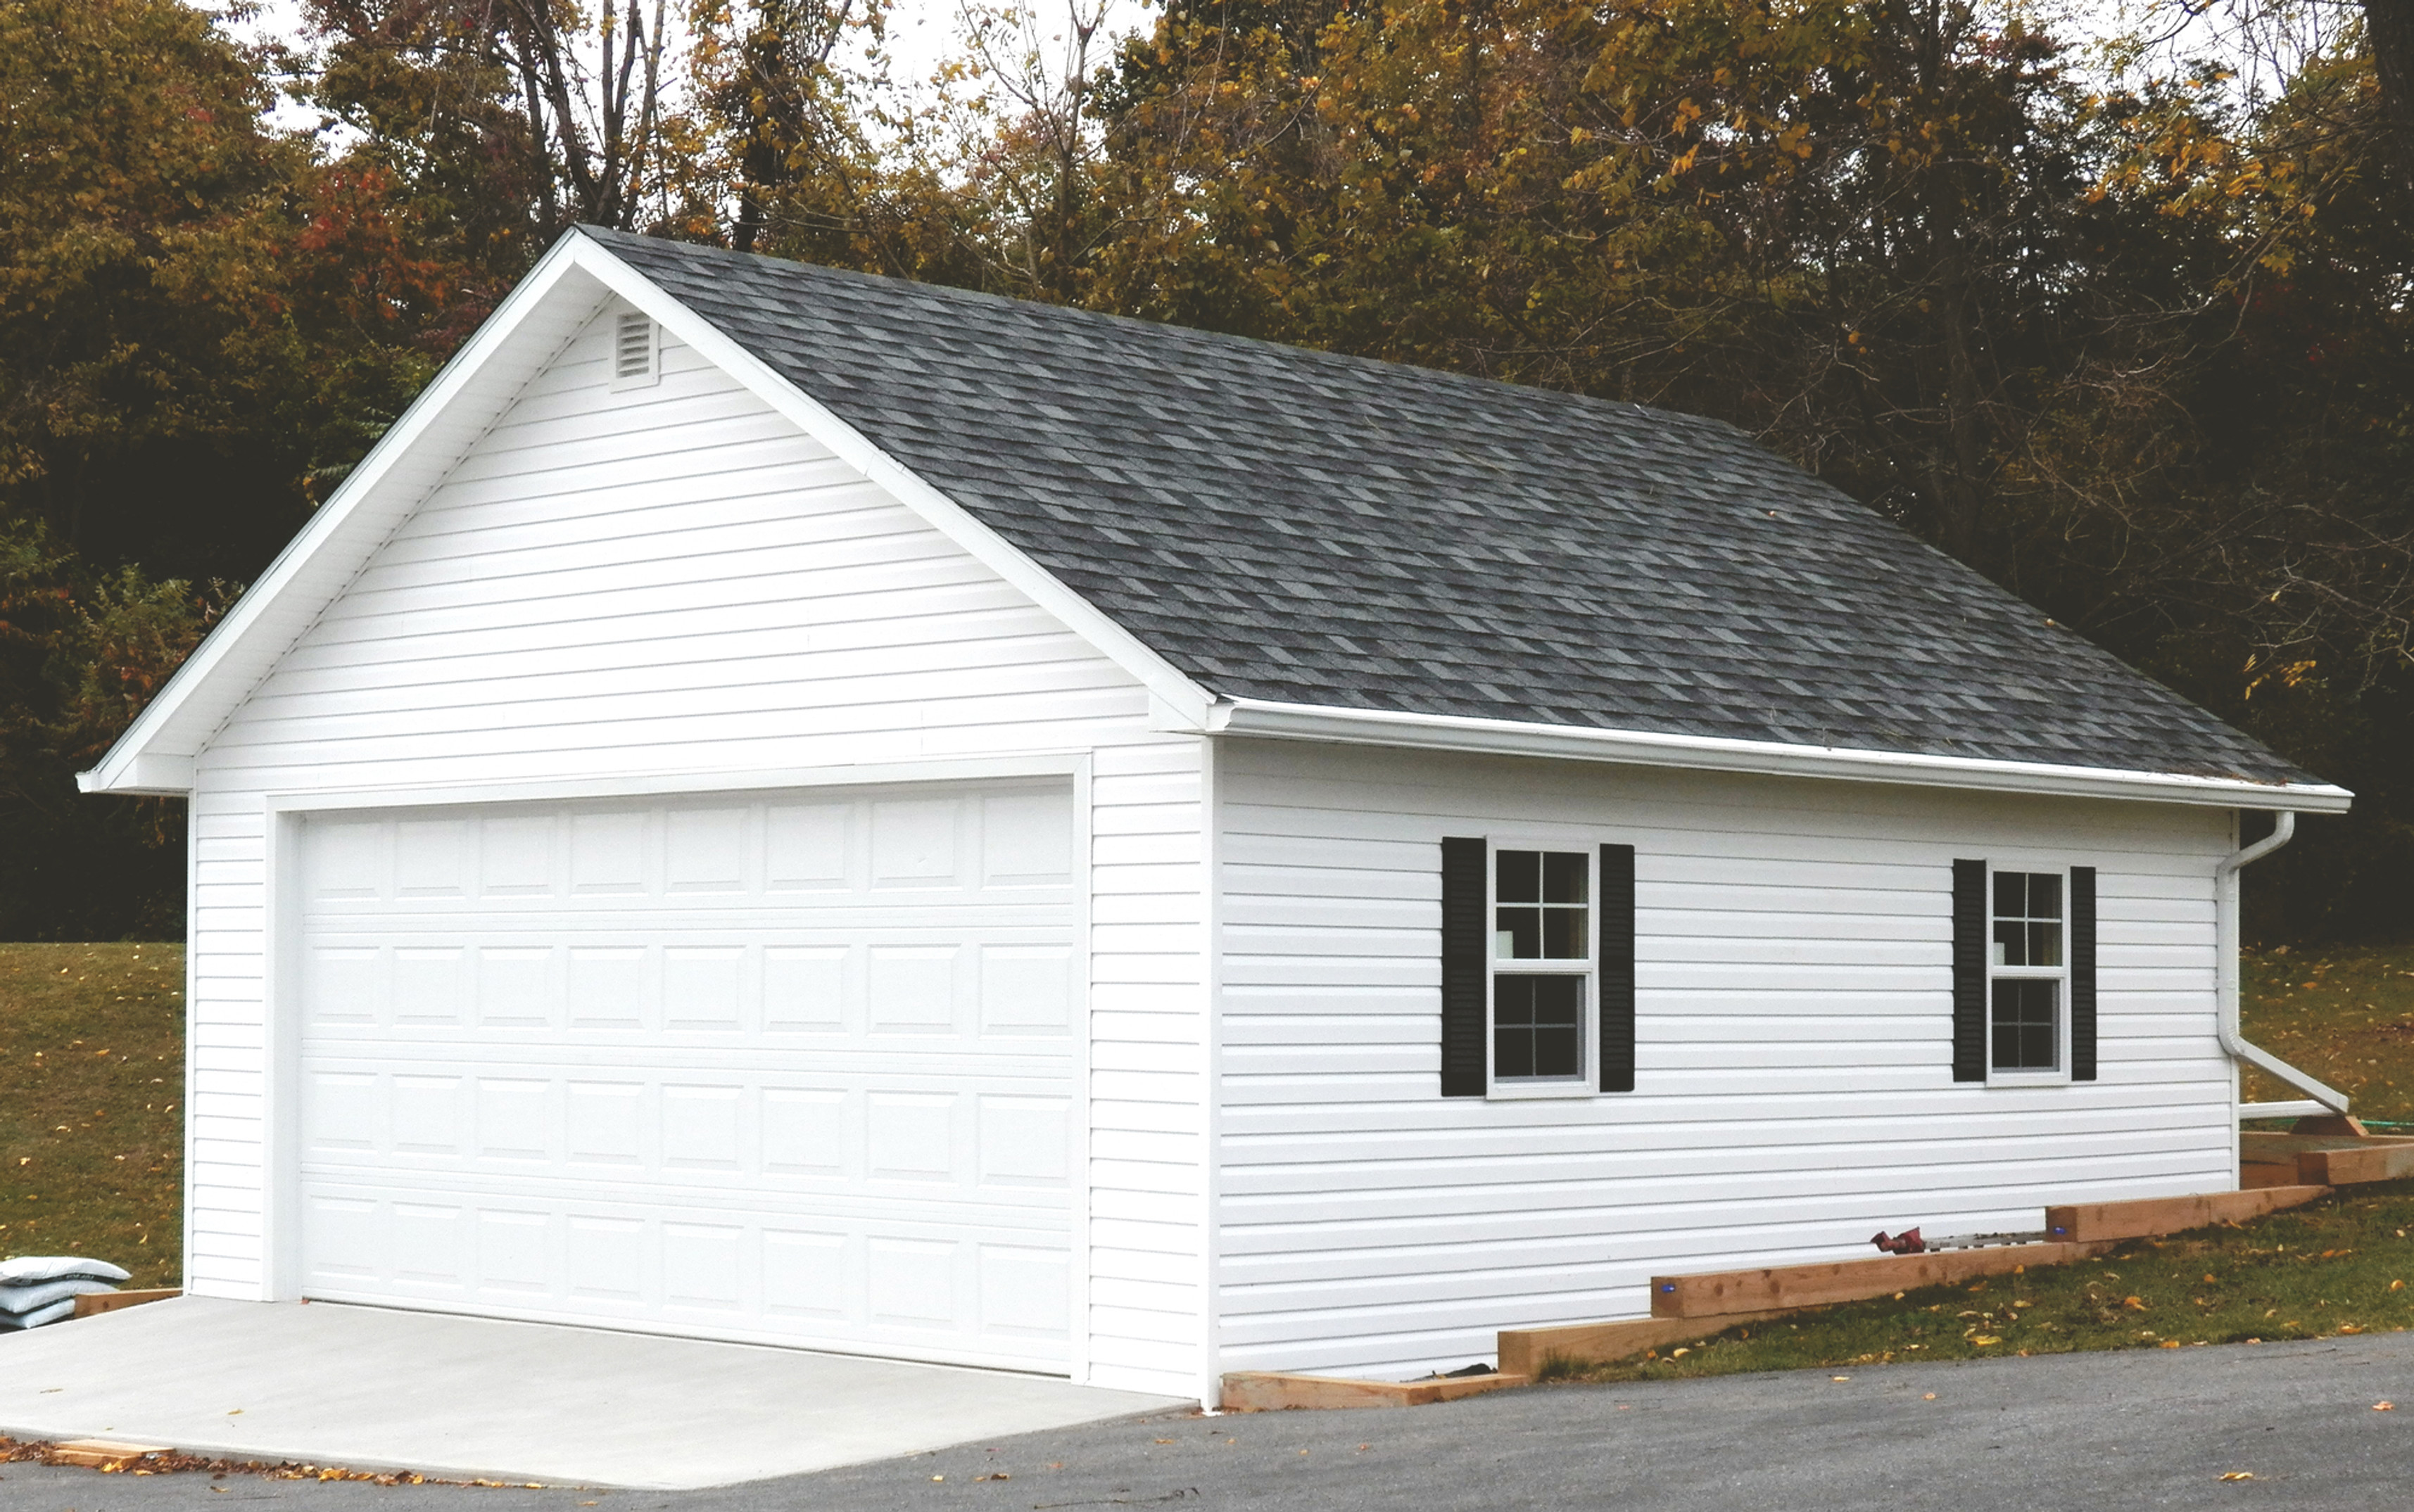 (+)Detached Garage/Outbuilding 1-2 Stall